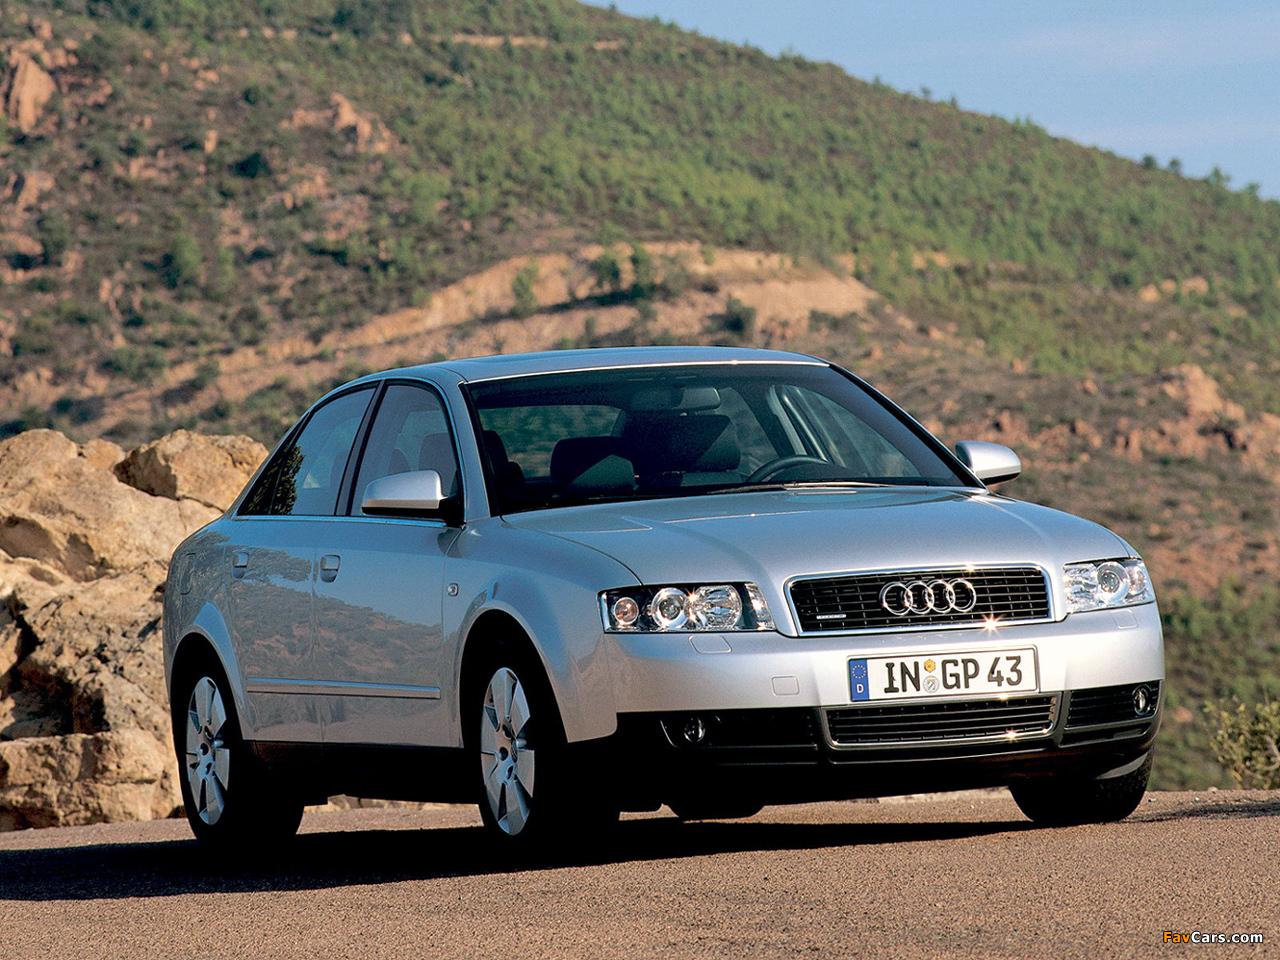 Photos Of Audi A4 2 5 Tdi Quattro Sedan B6 8e 2000 2004